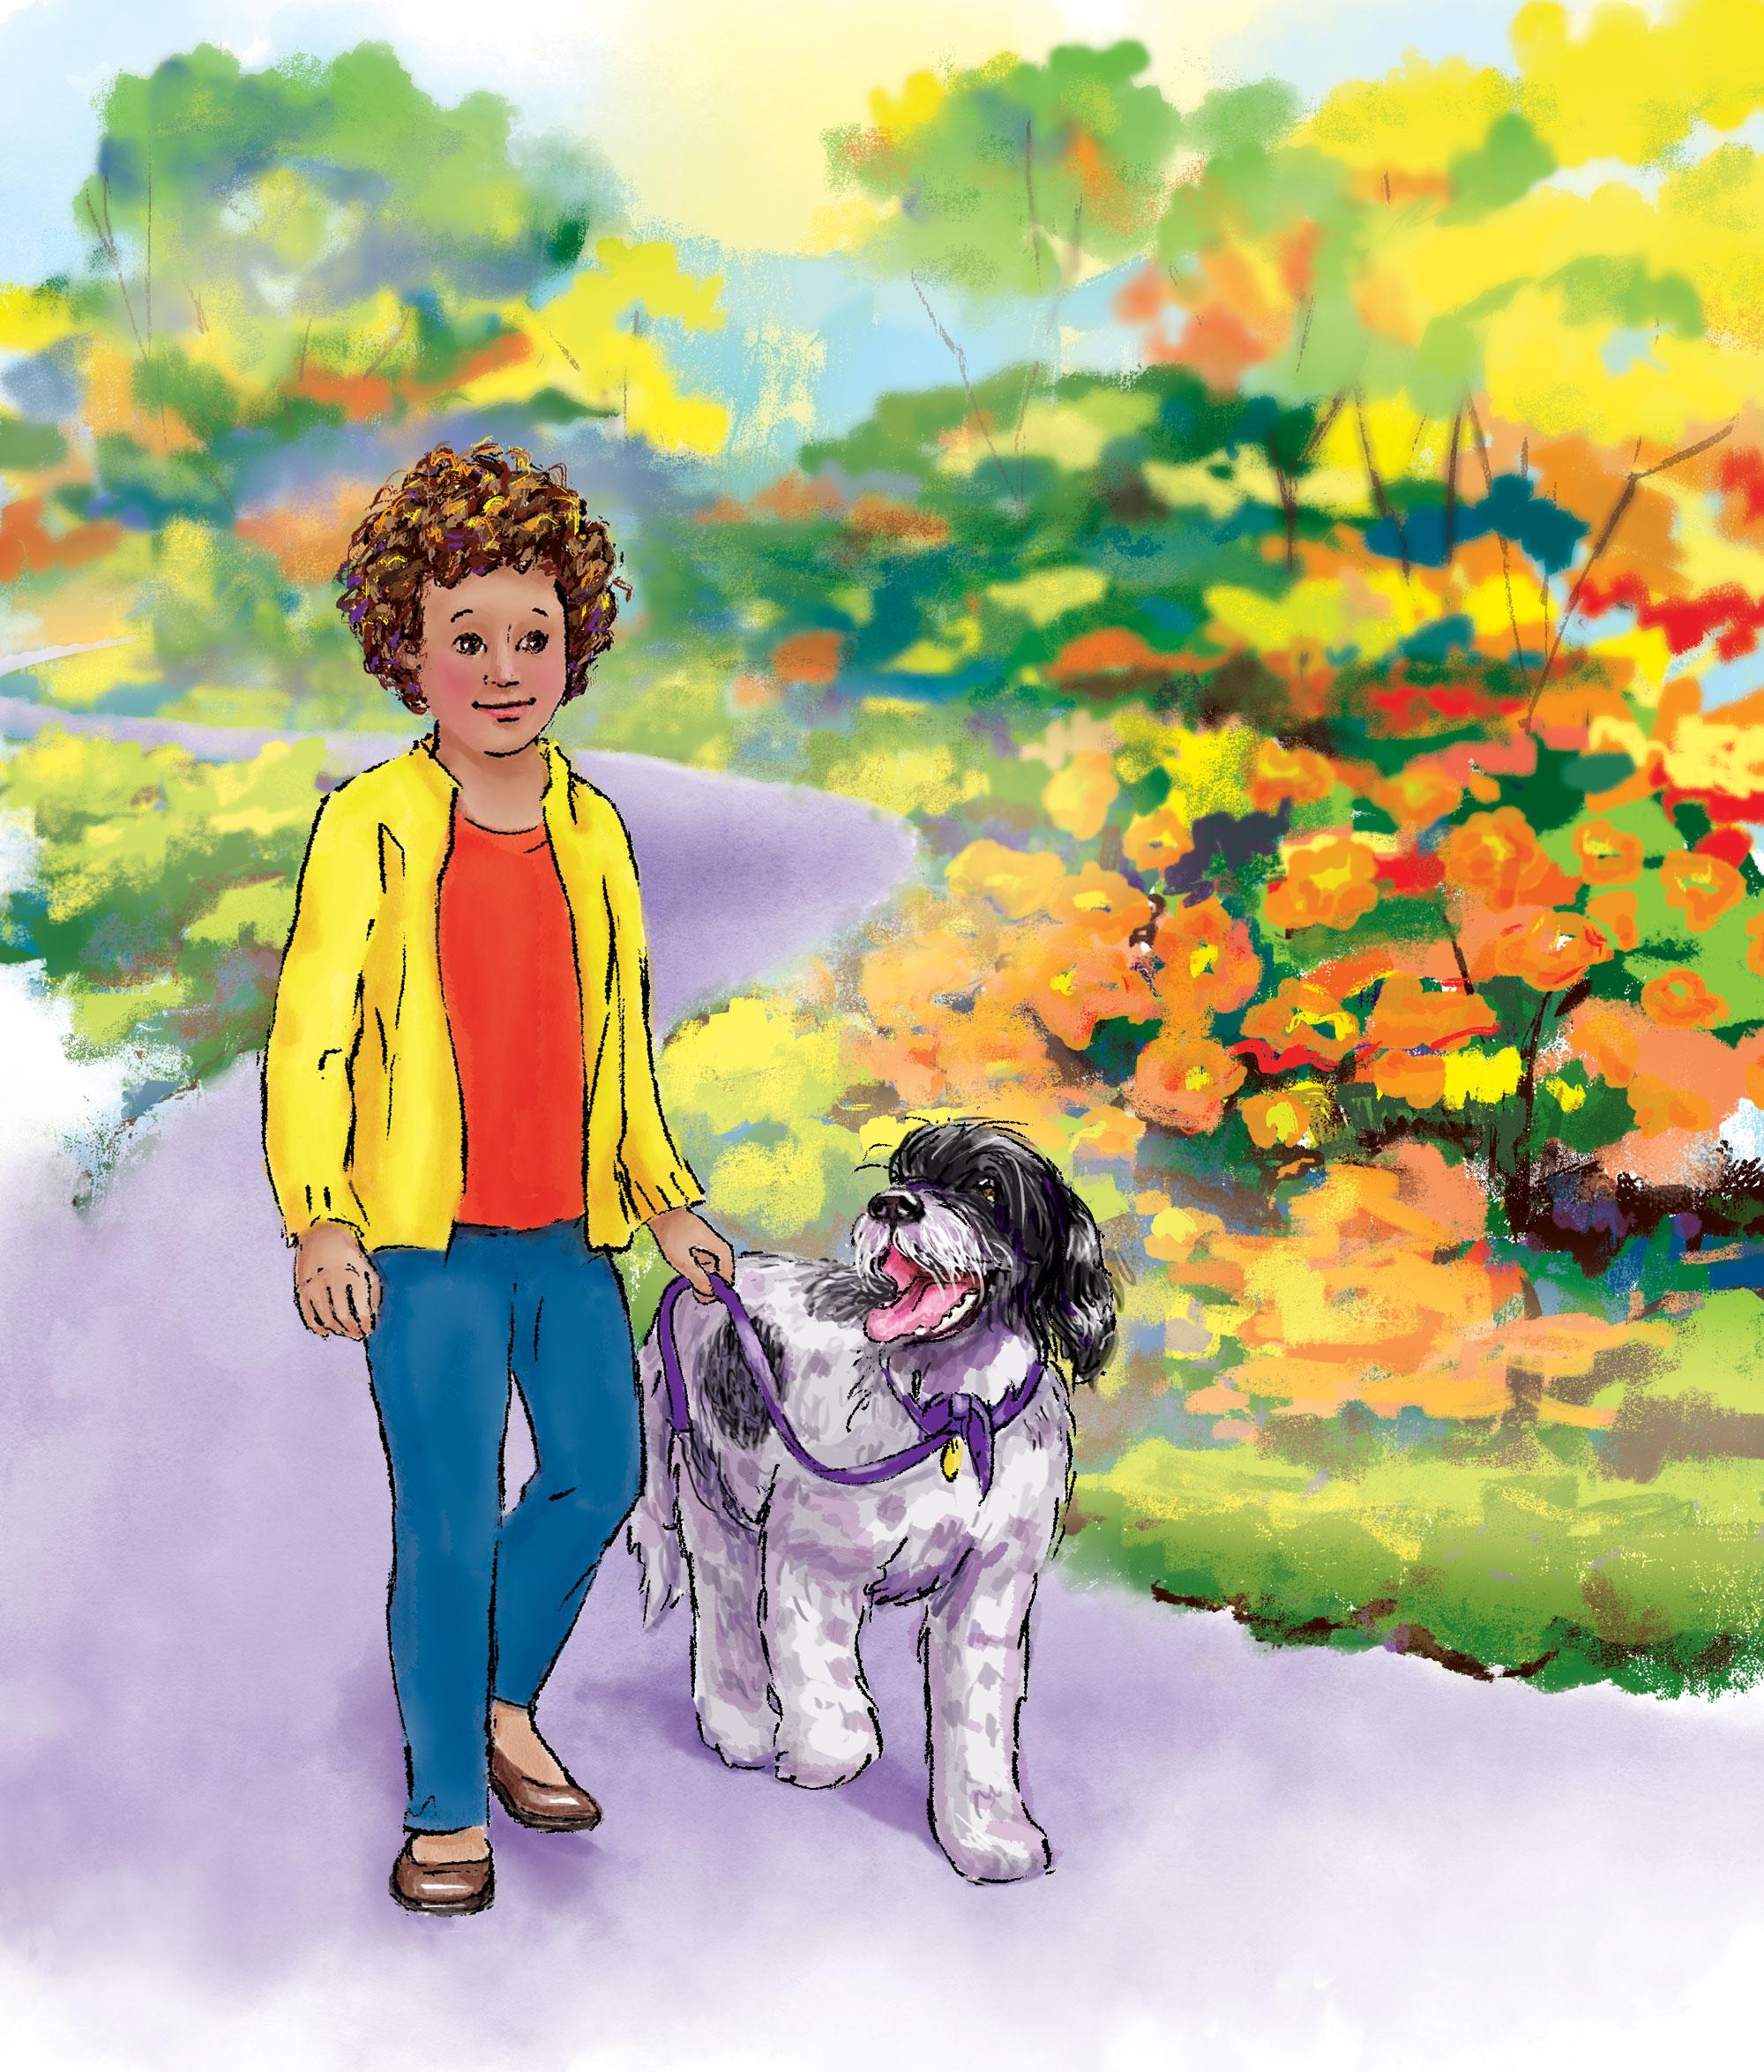 Sam and Suki Go for Walks